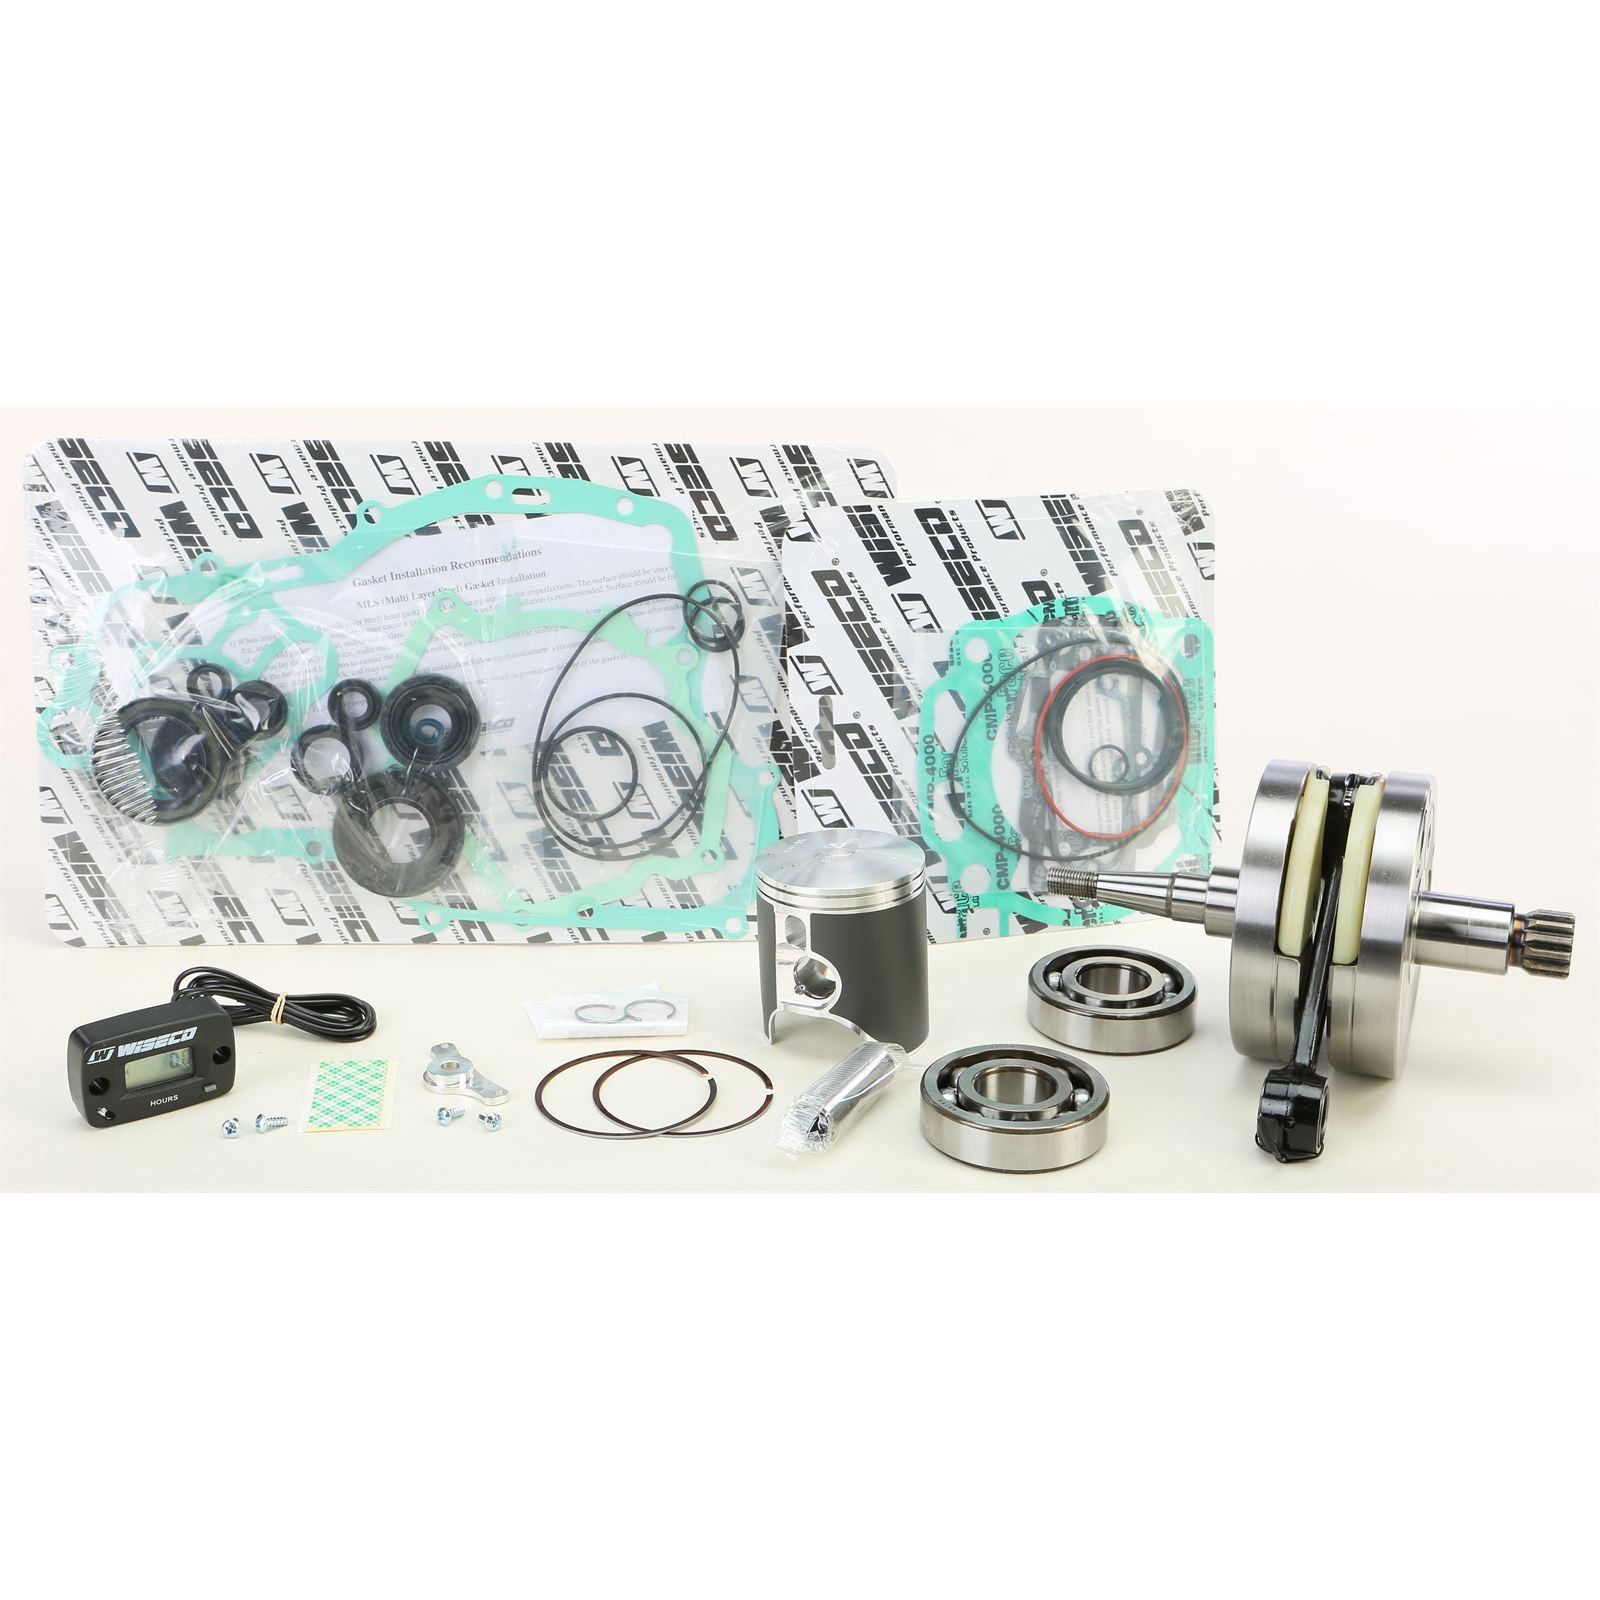 Wiseco Garage Buddy Engine Rebuild Kit